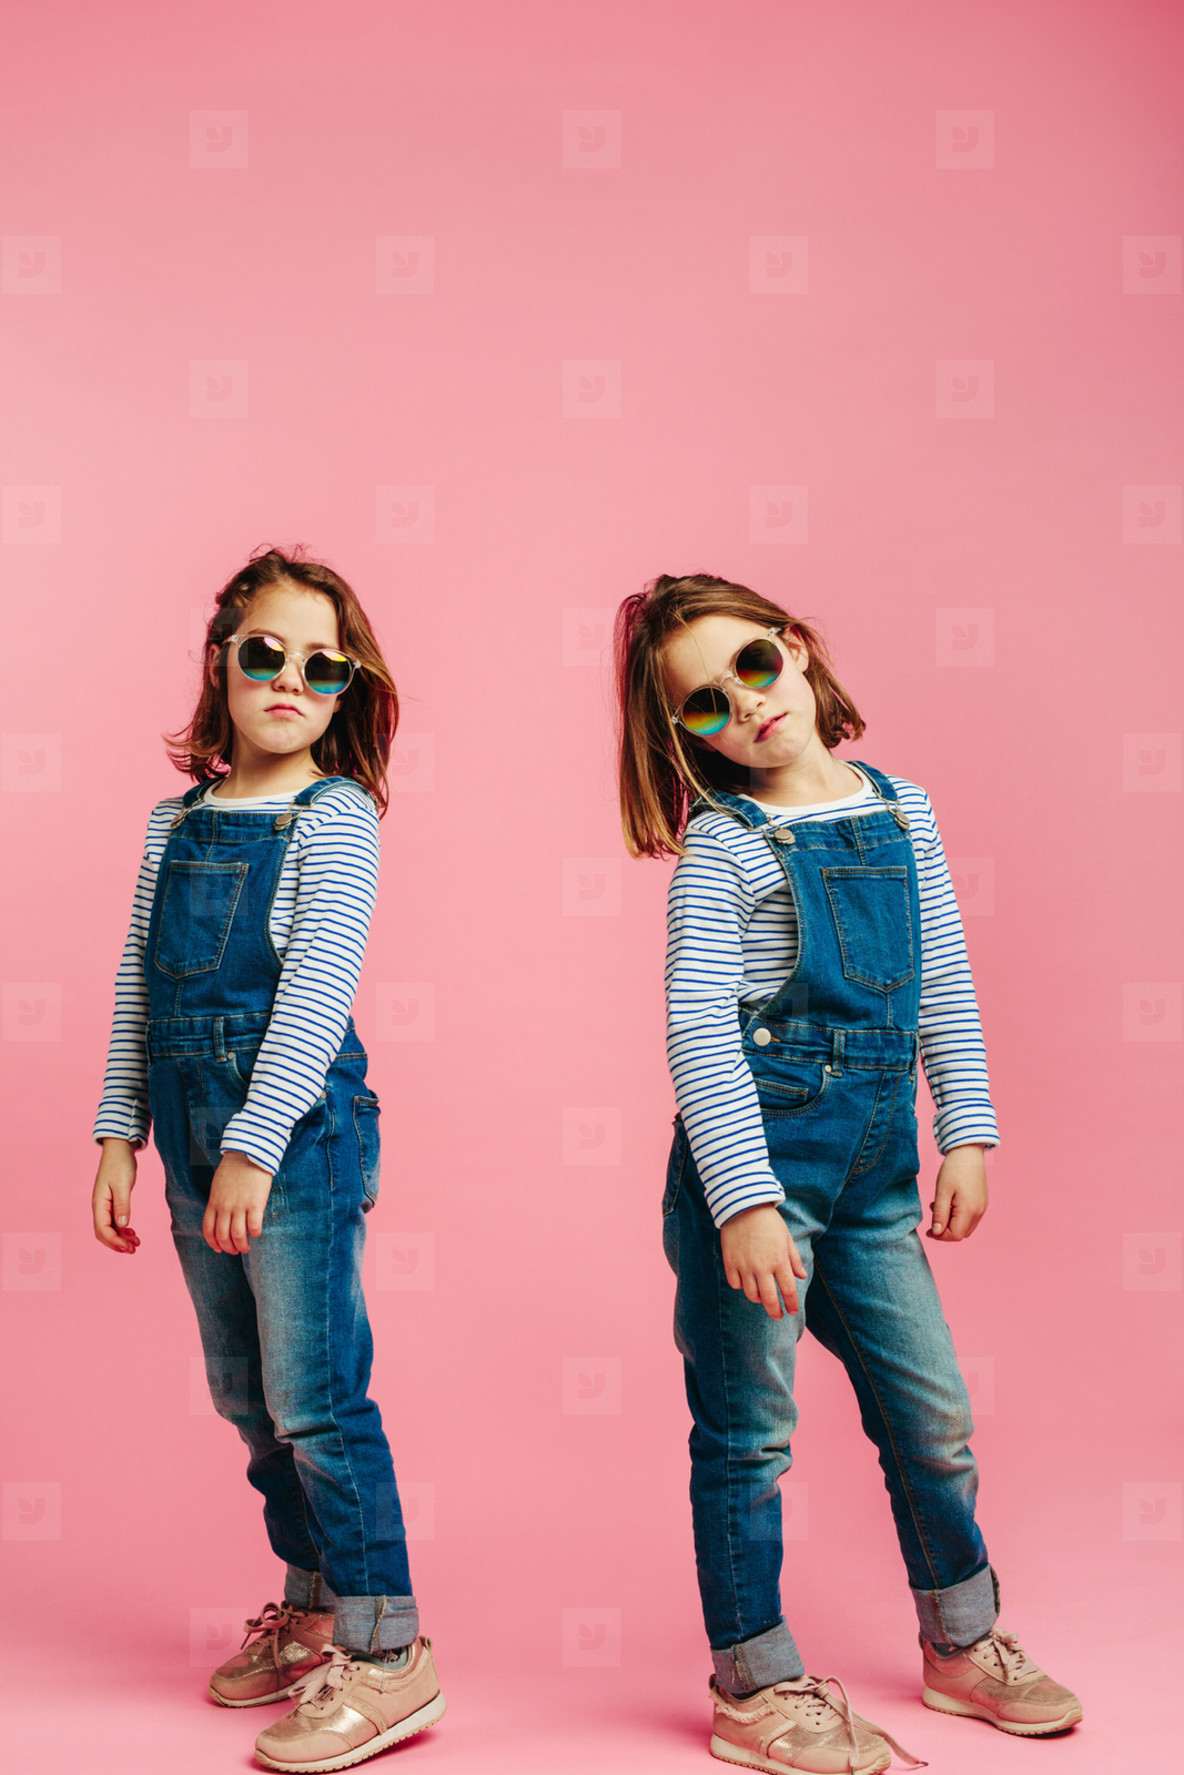 Stylish girls in denim dungarees